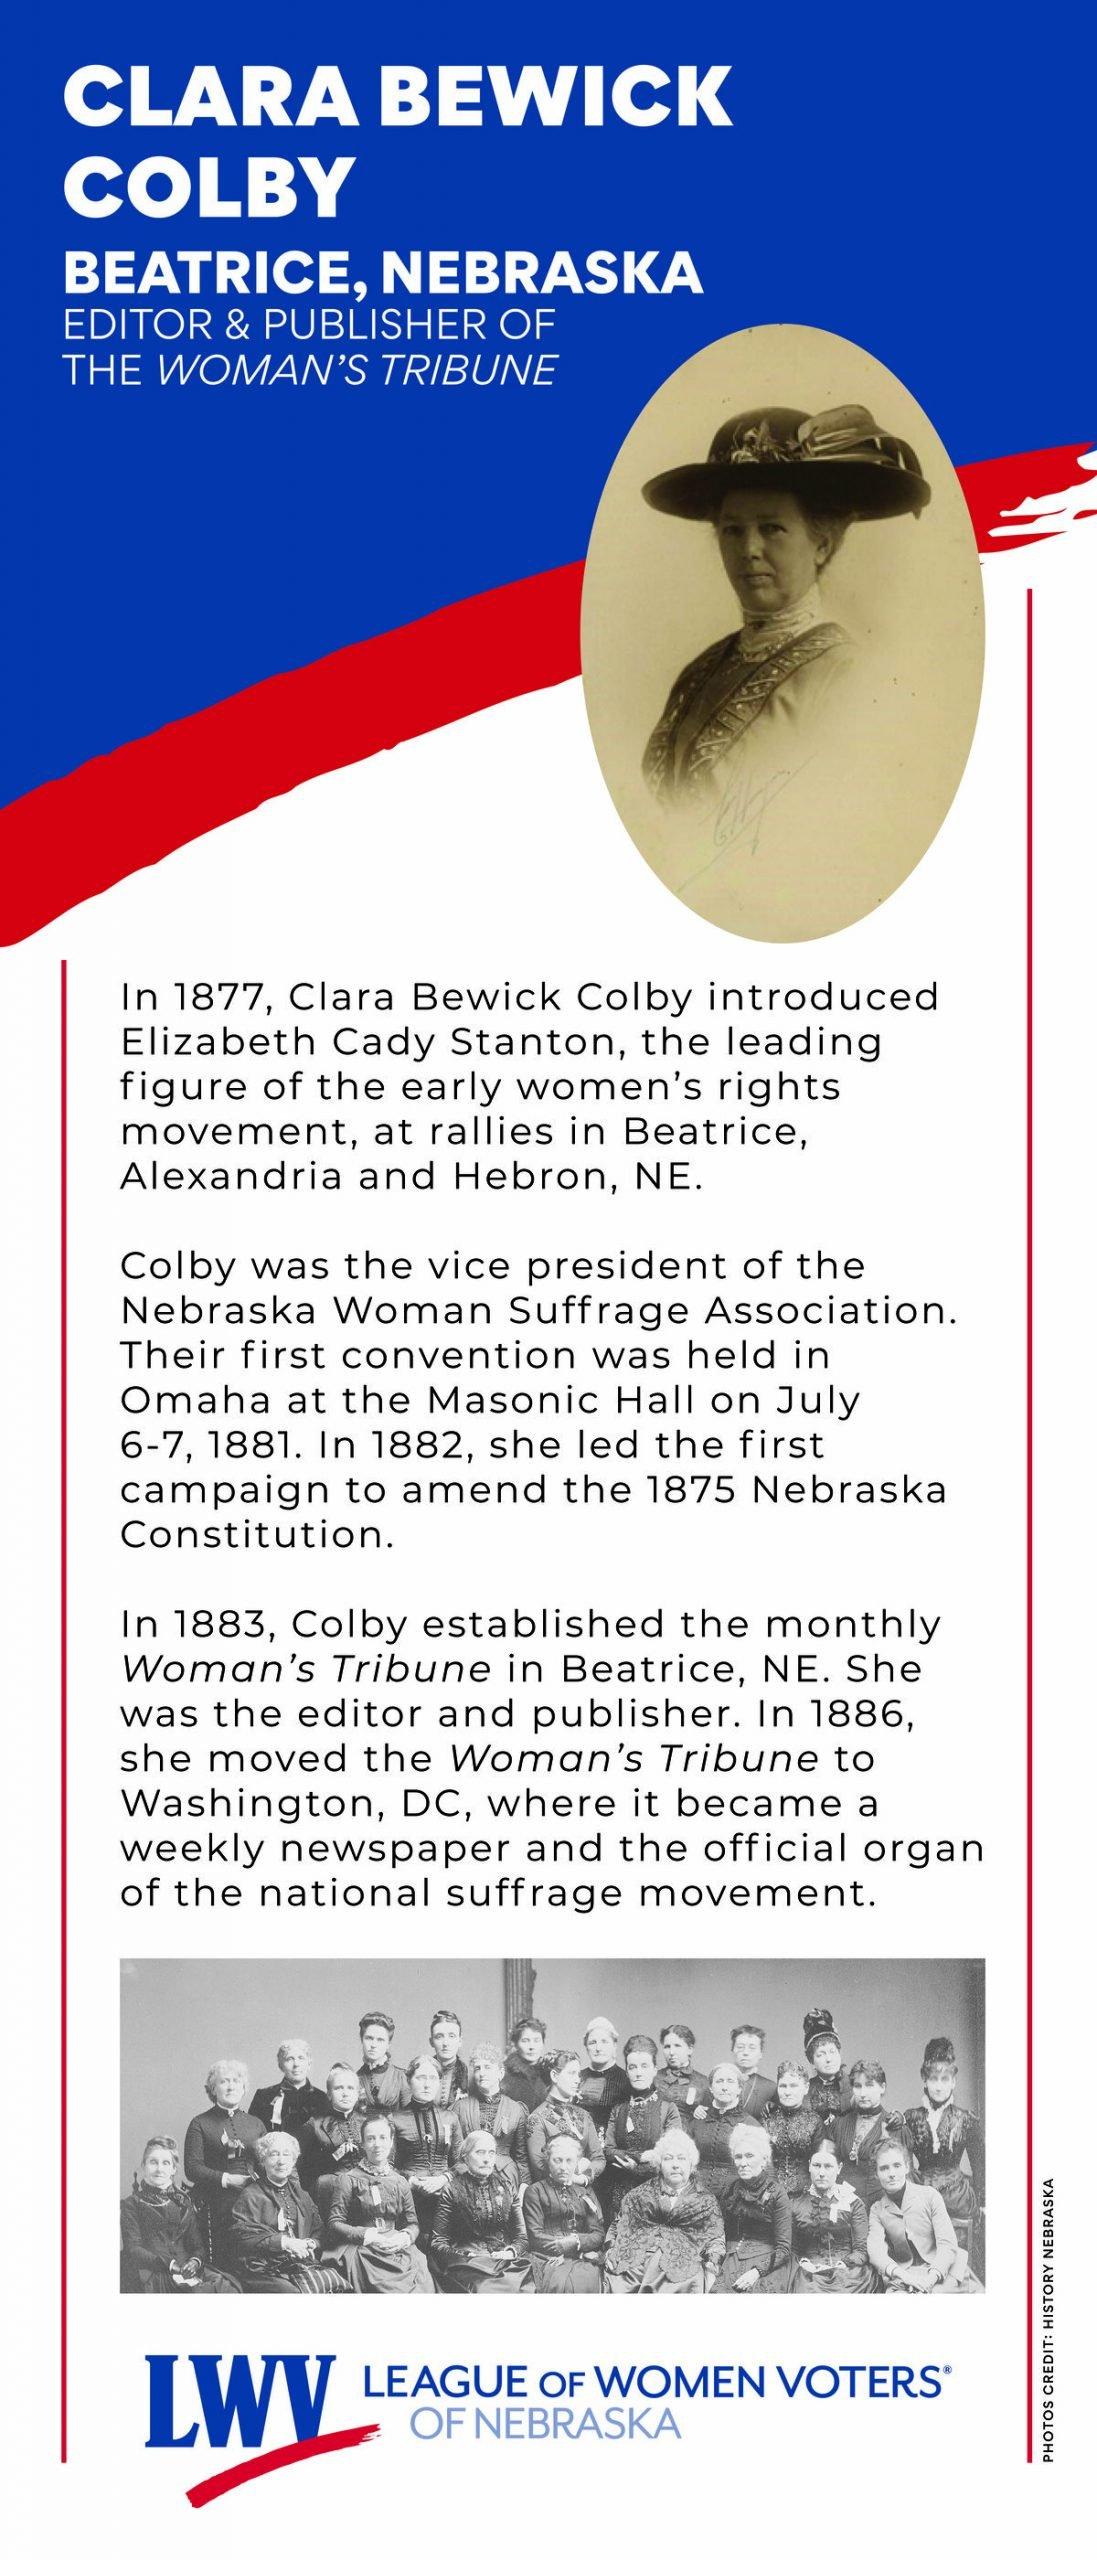 Clara Bewick Colby